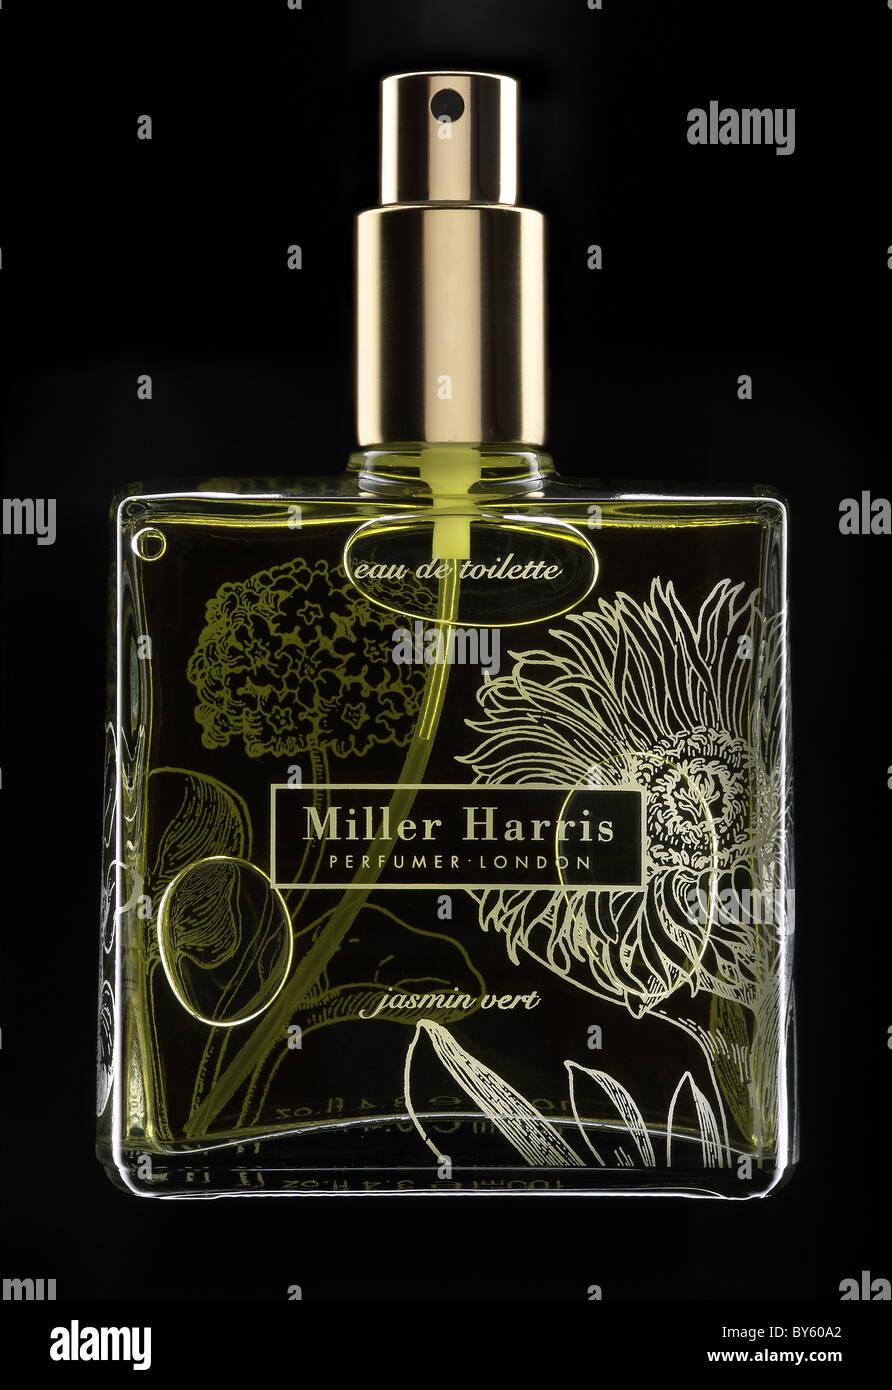 Miller Harris Perfumer London eau de toilette - Stock Image